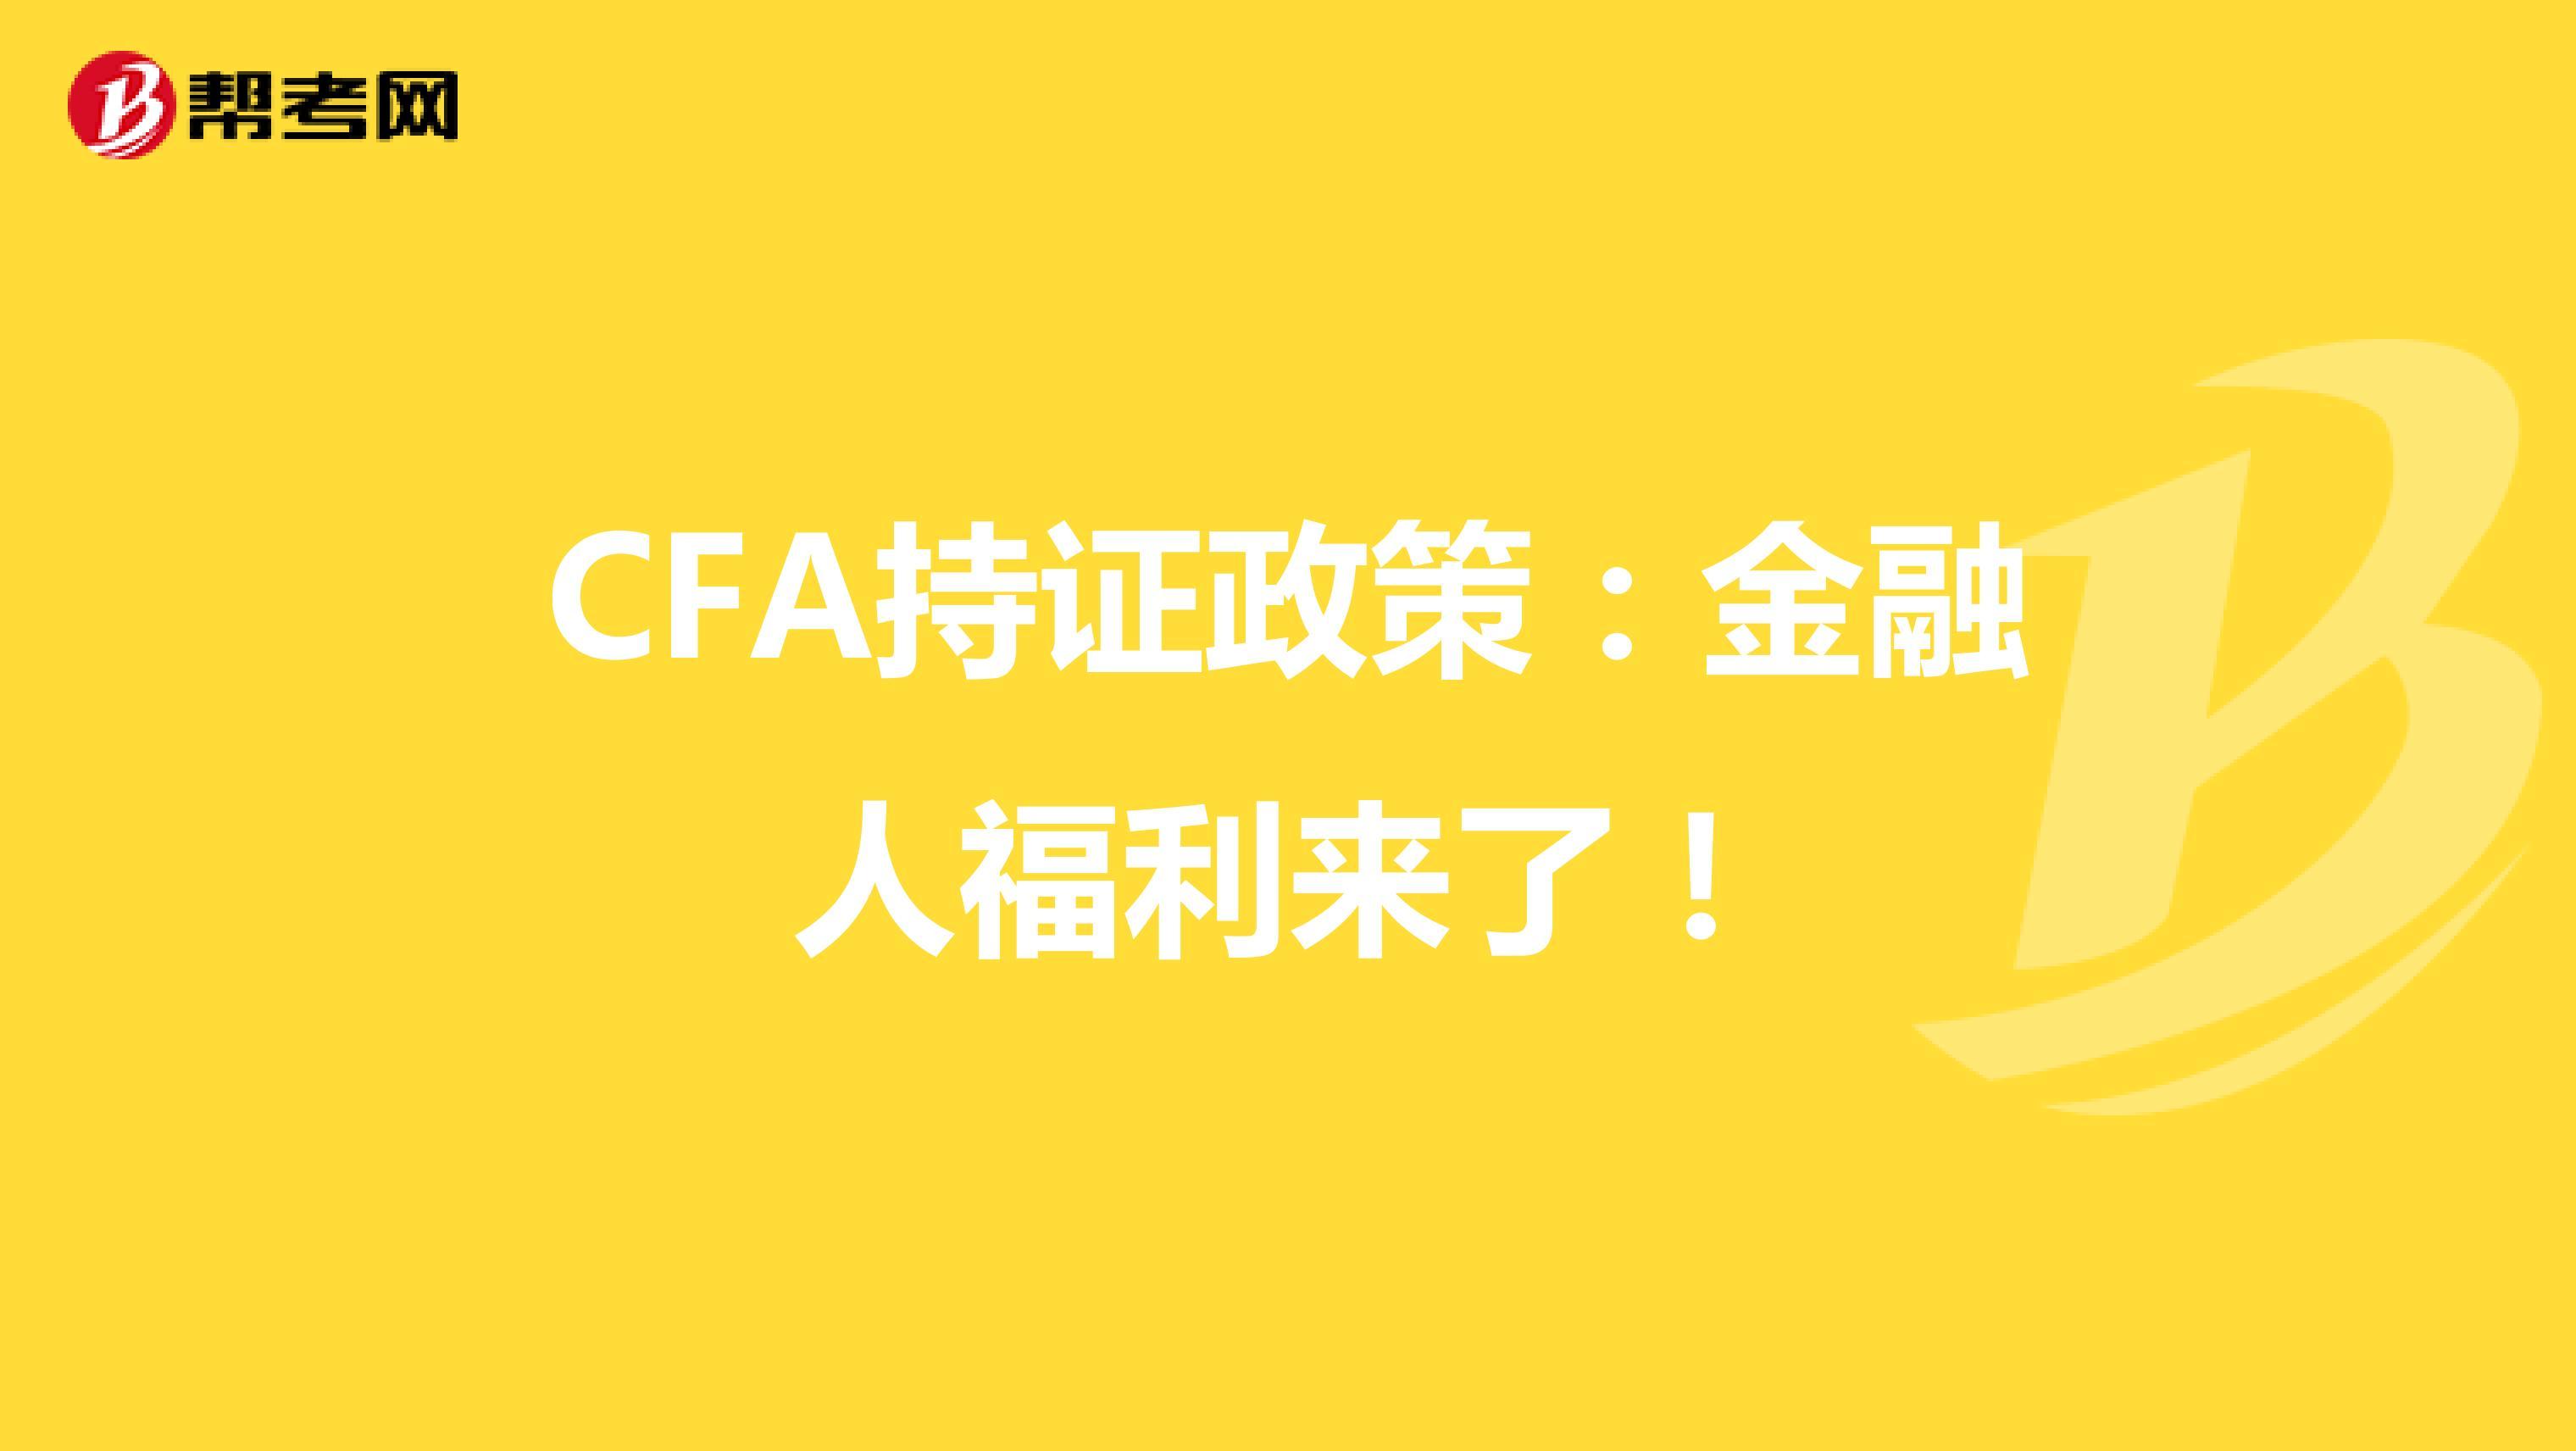 CFA持证政策:金融人福利来了!